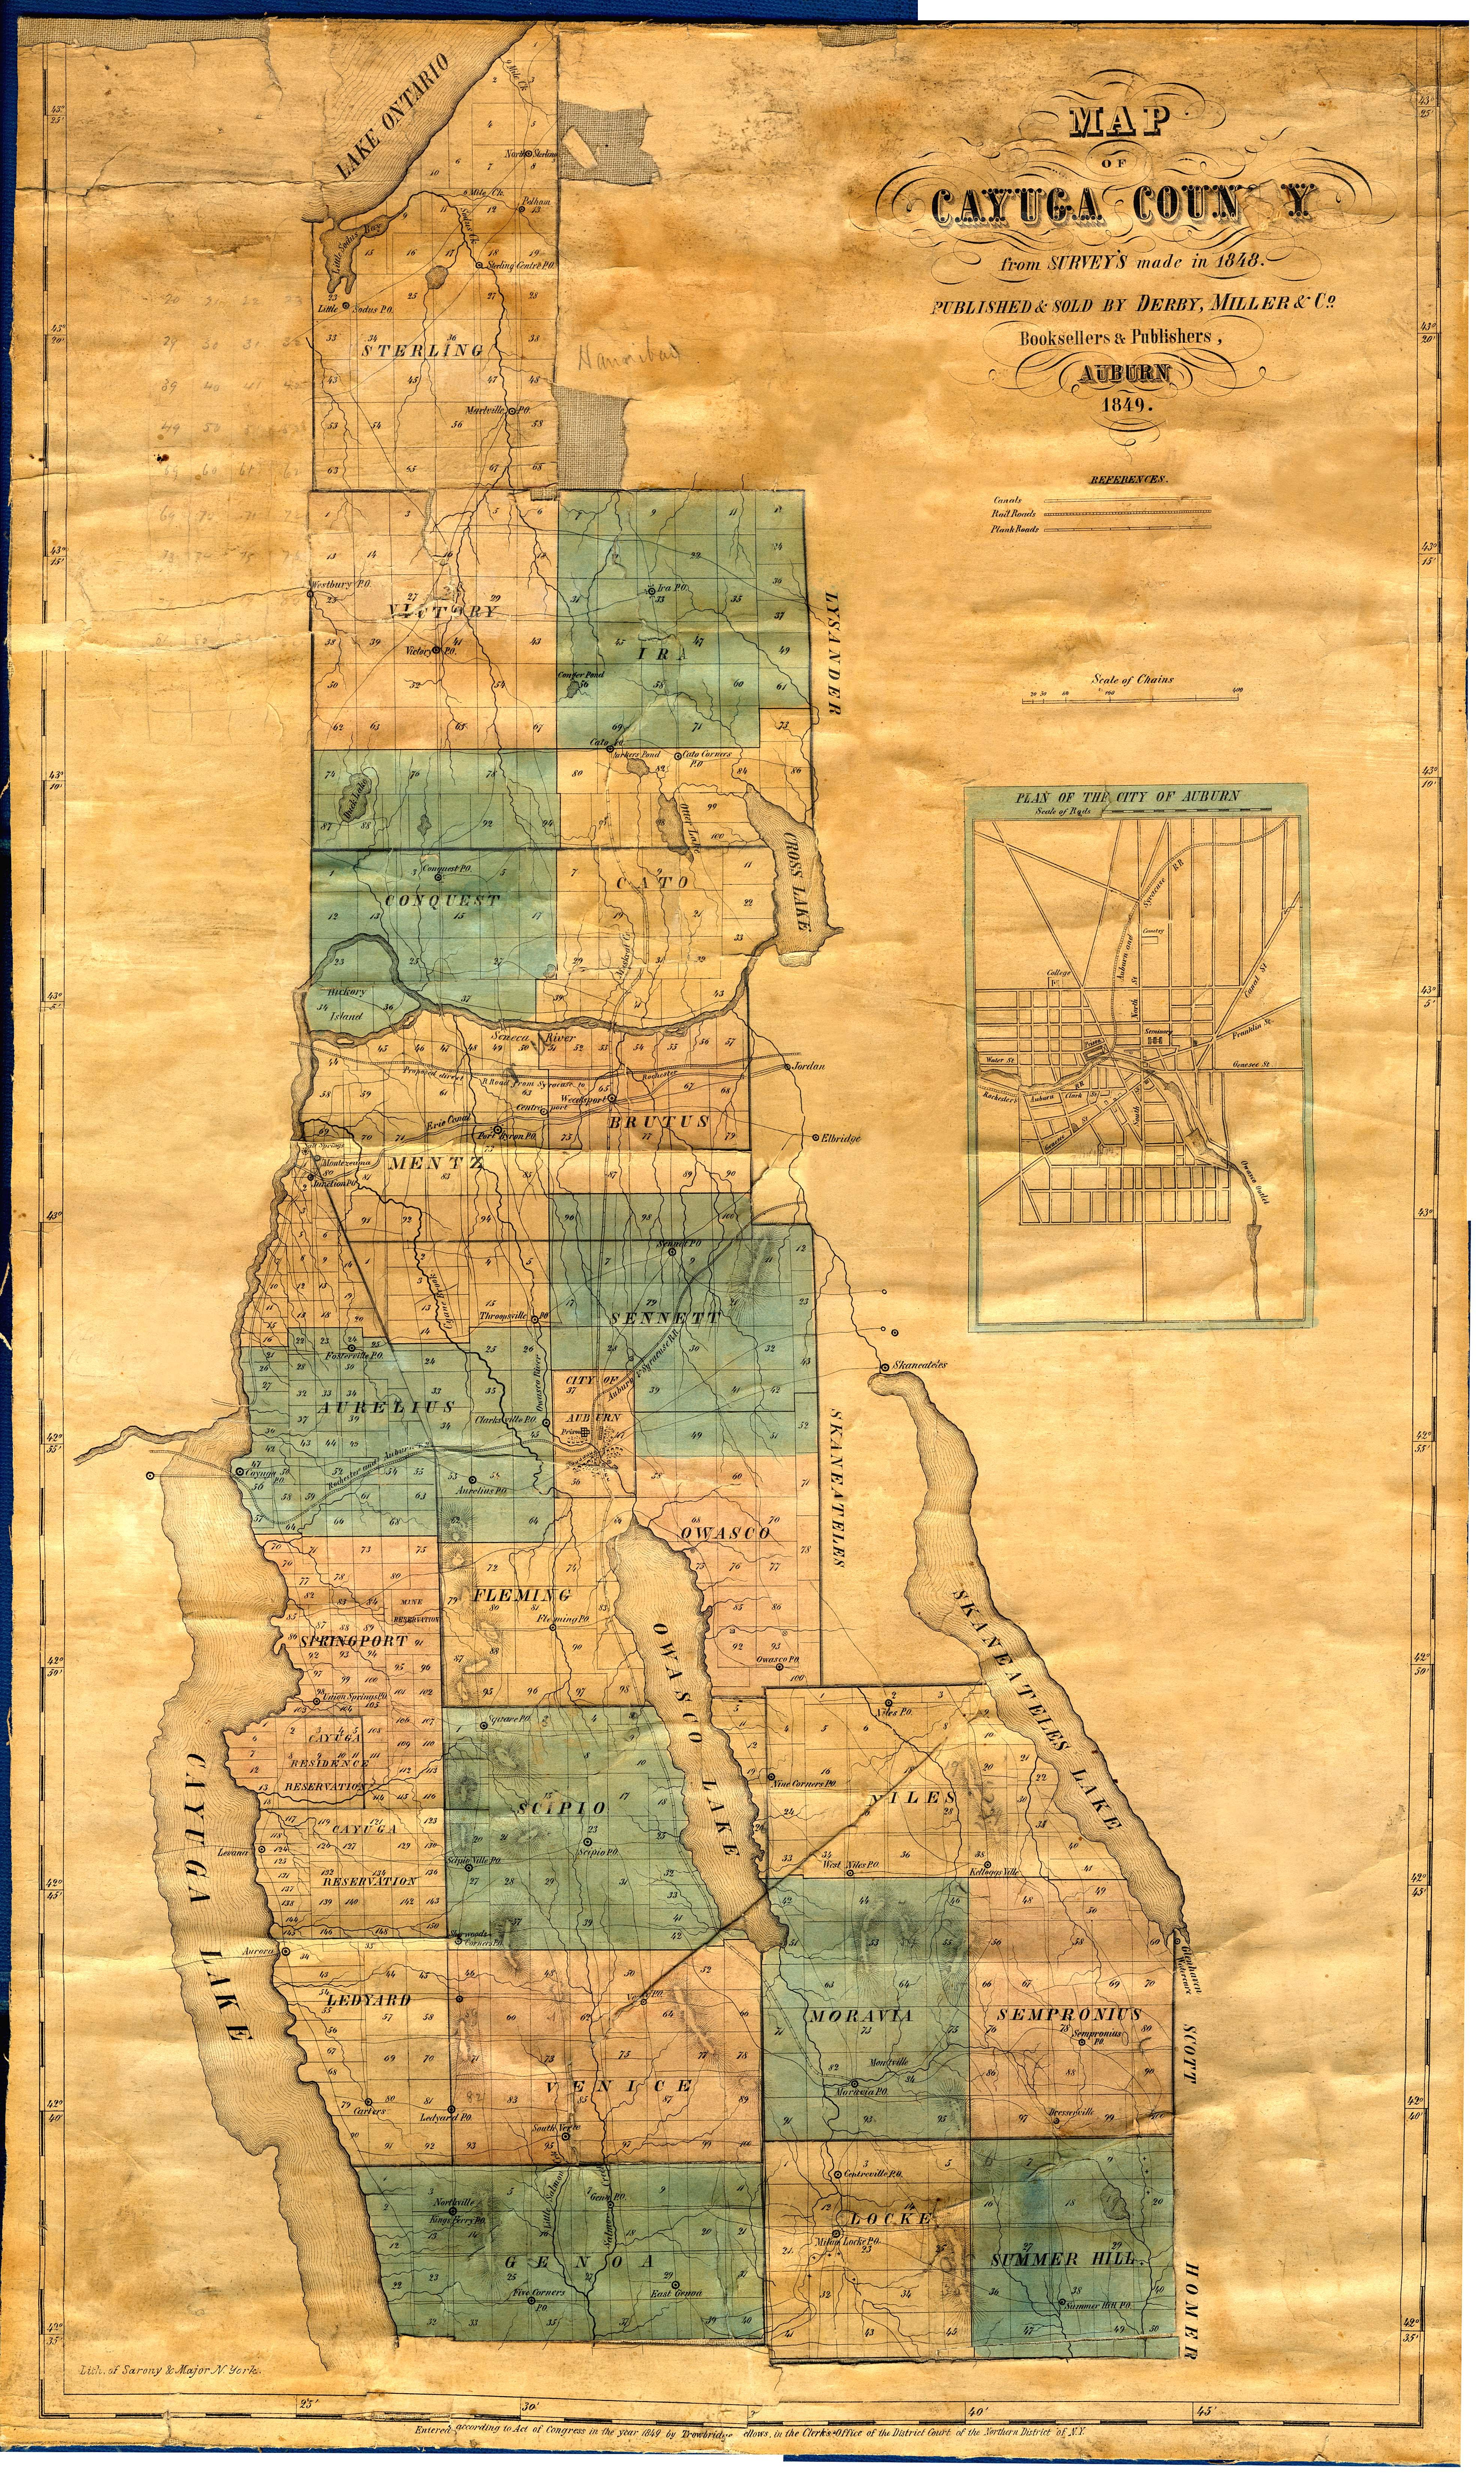 New york cayuga county - 1849 Map Of Cayuga County